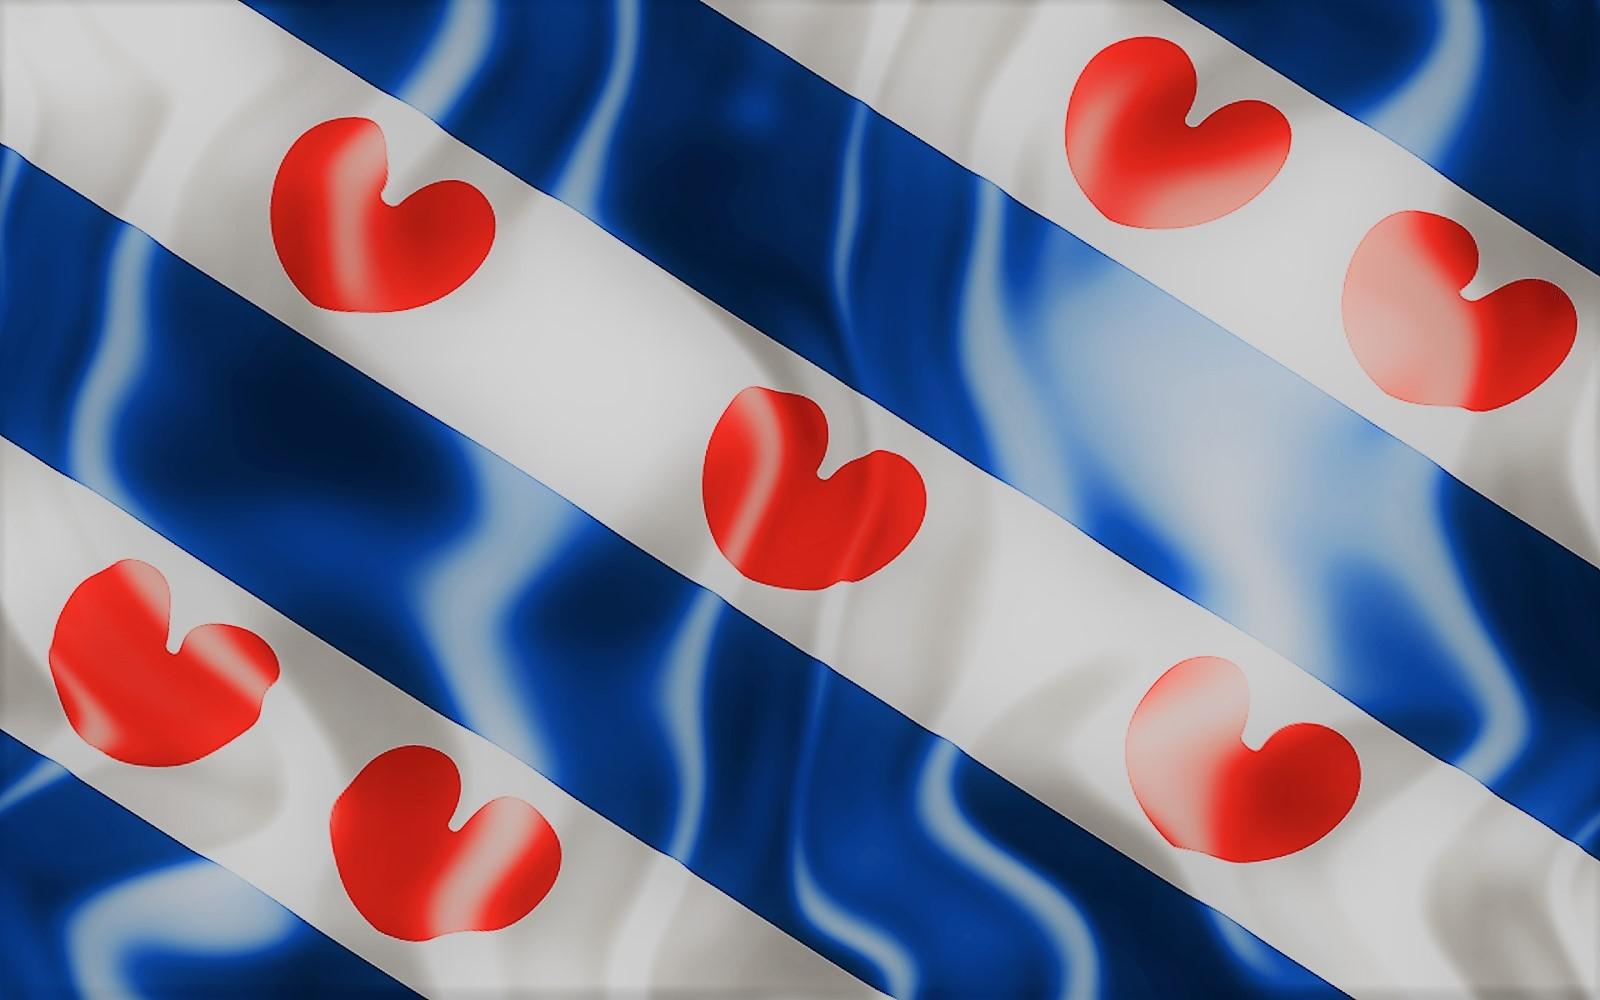 Provincievlag-Friesland-Friese-vlag-20x30-1-3d